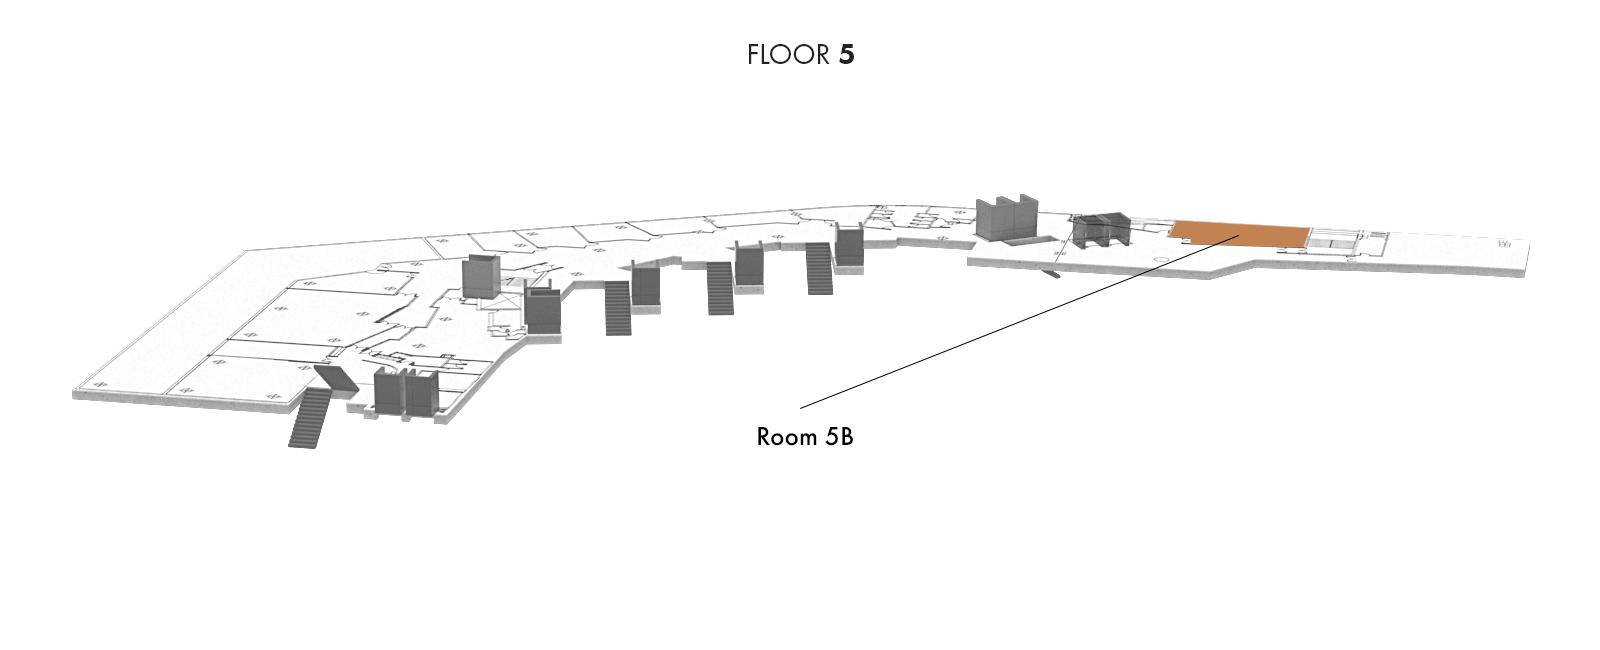 Room 5B, Floor 5  Palacio Euskalduna Jauregia